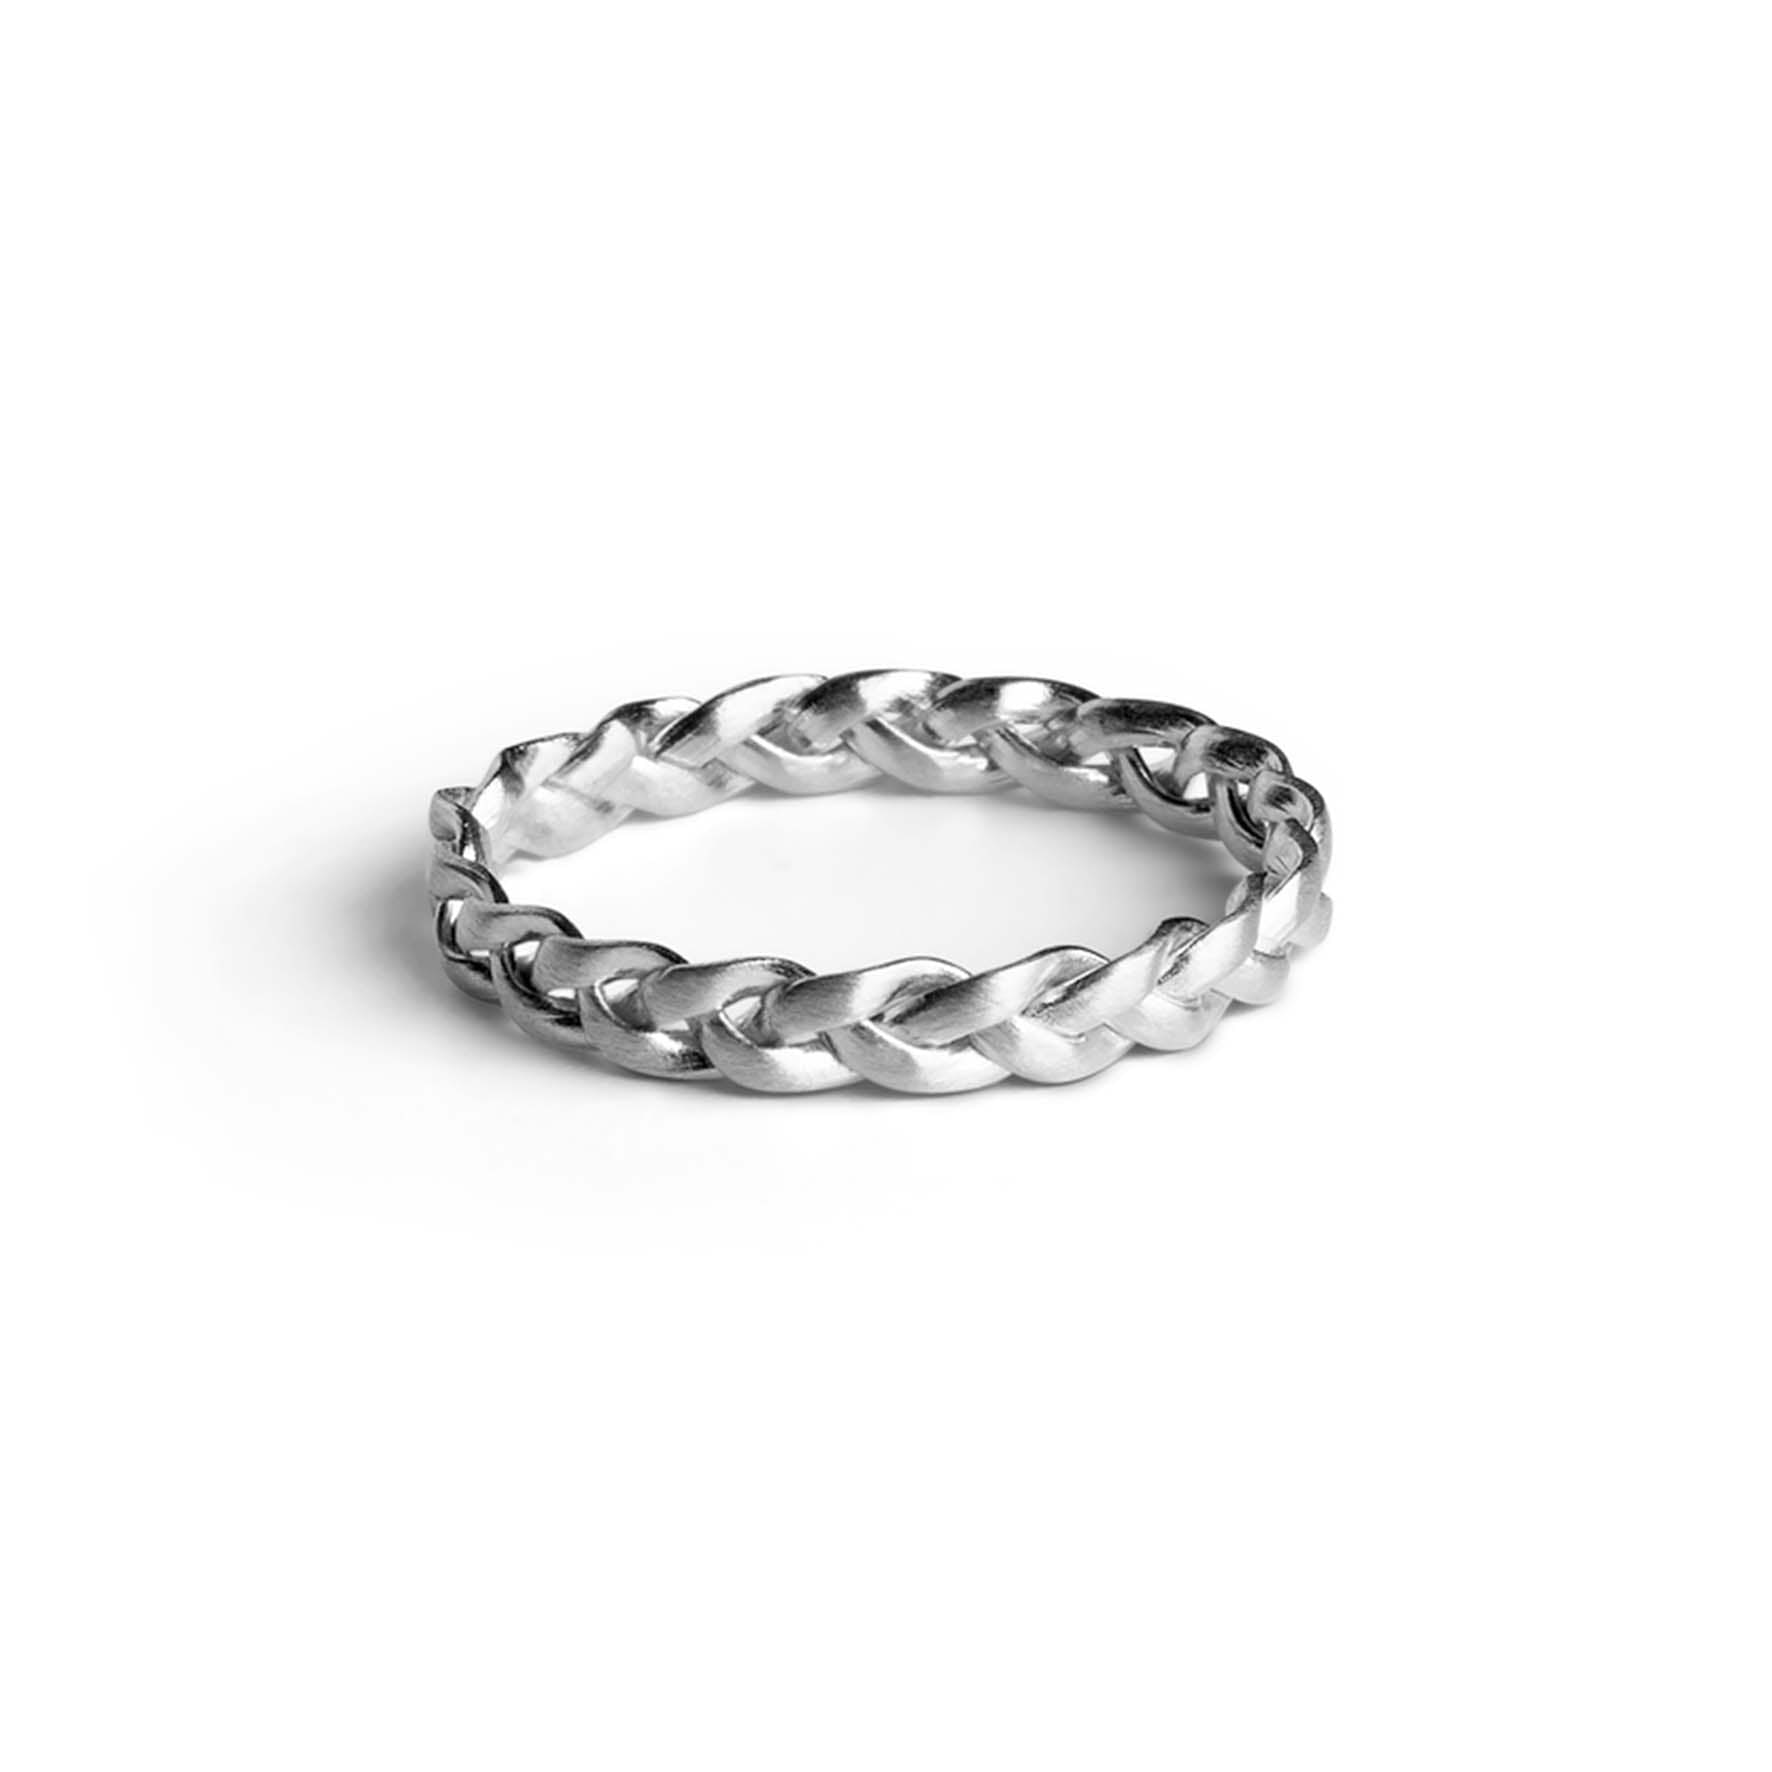 Small Braided Ring von Jane Kønig in Silber Sterling 925